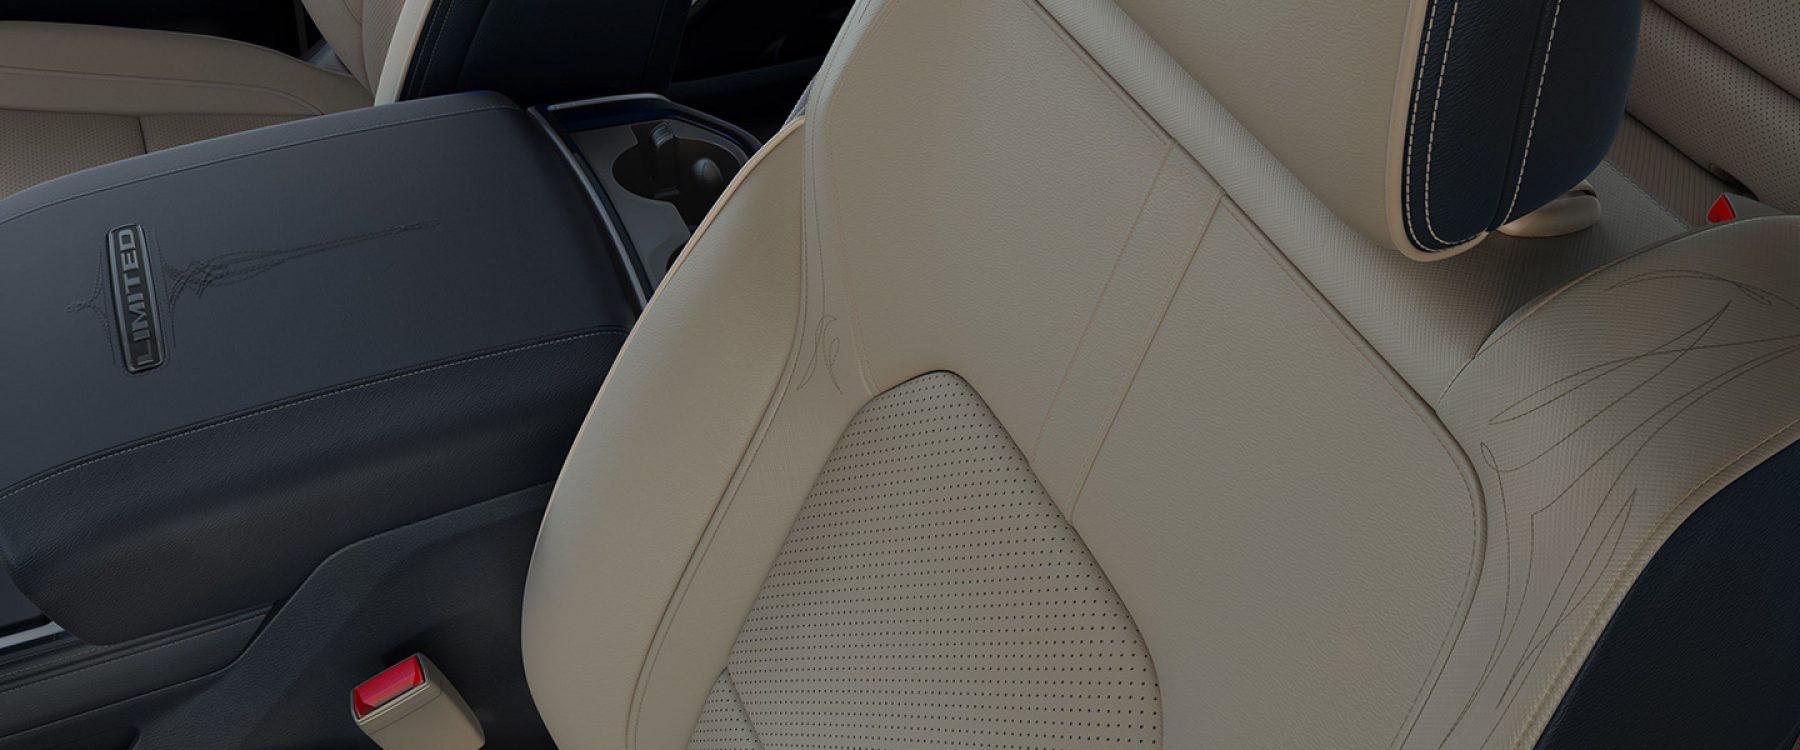 2019 Ram 1500 Interior Seats Limited indigo light frost beige